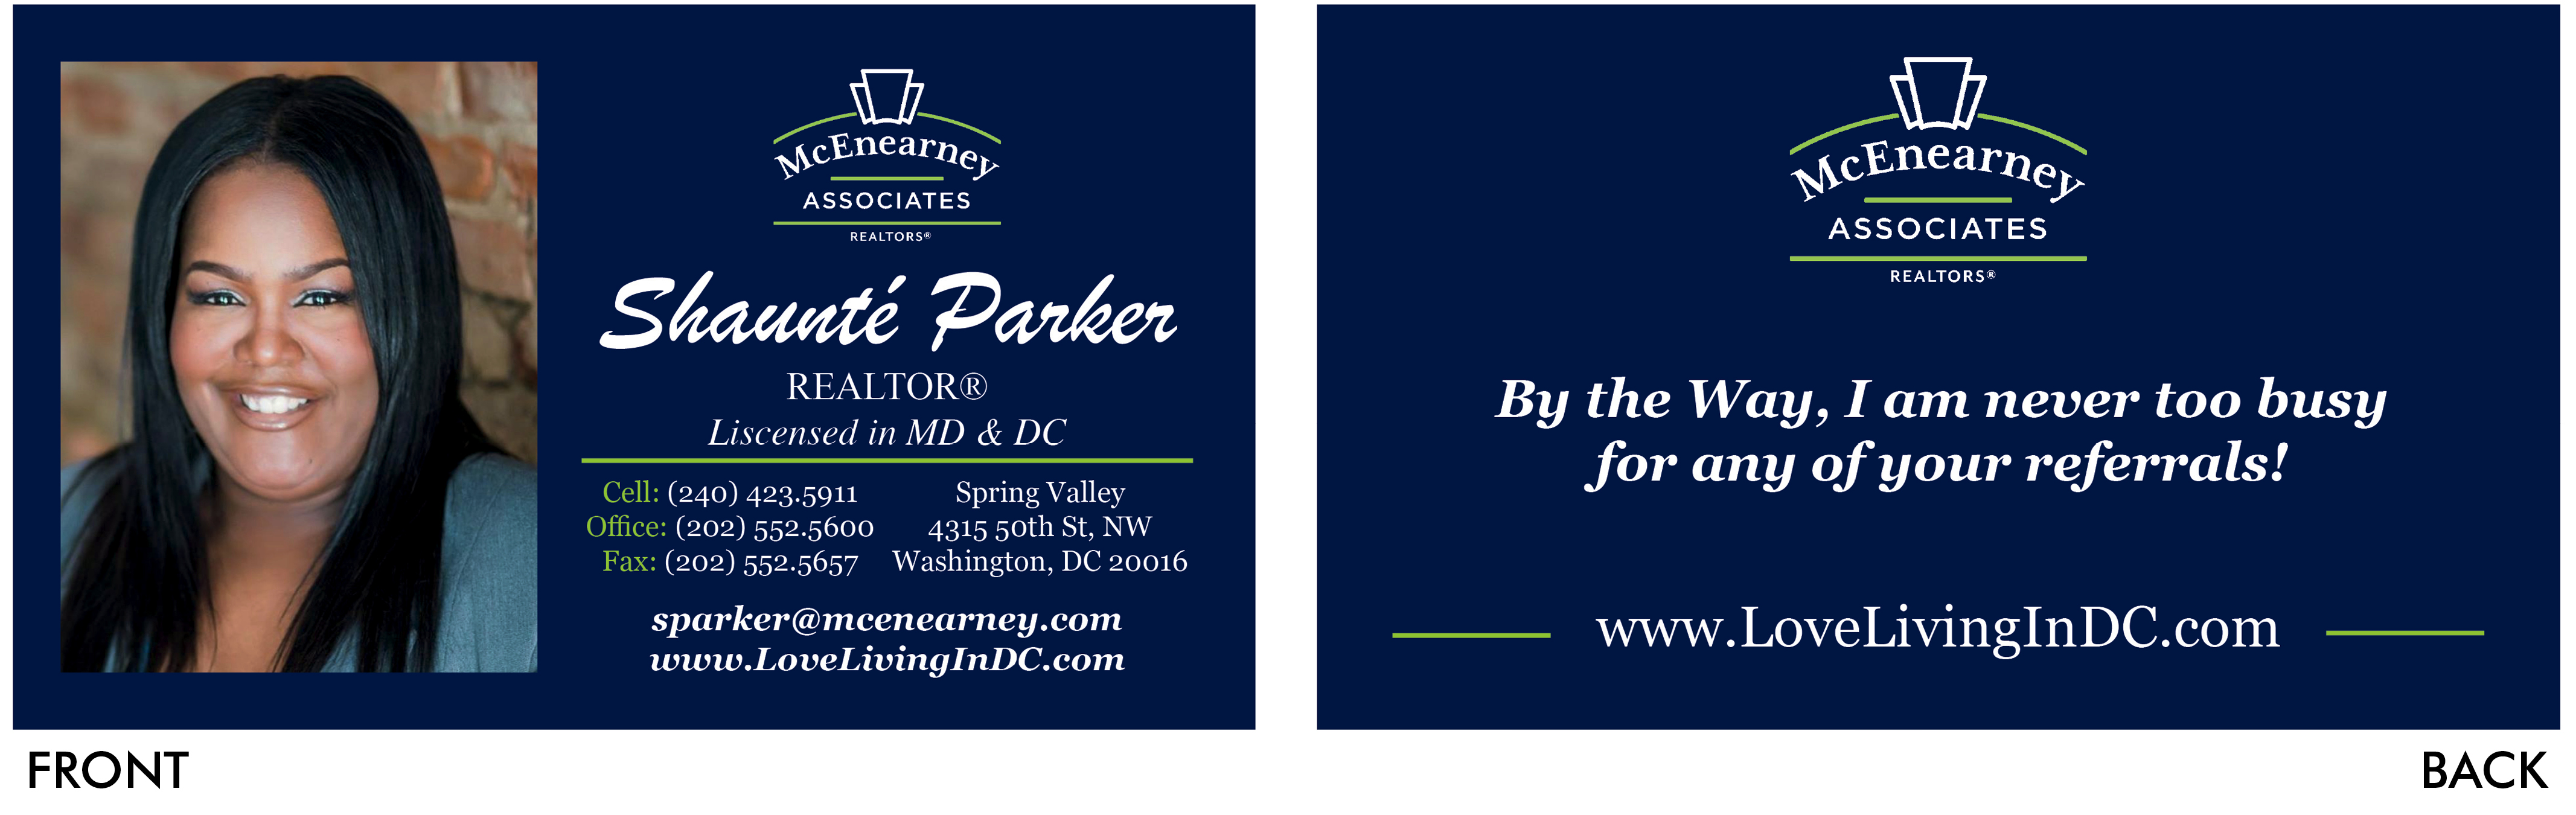 Shaunte Parker Business Card